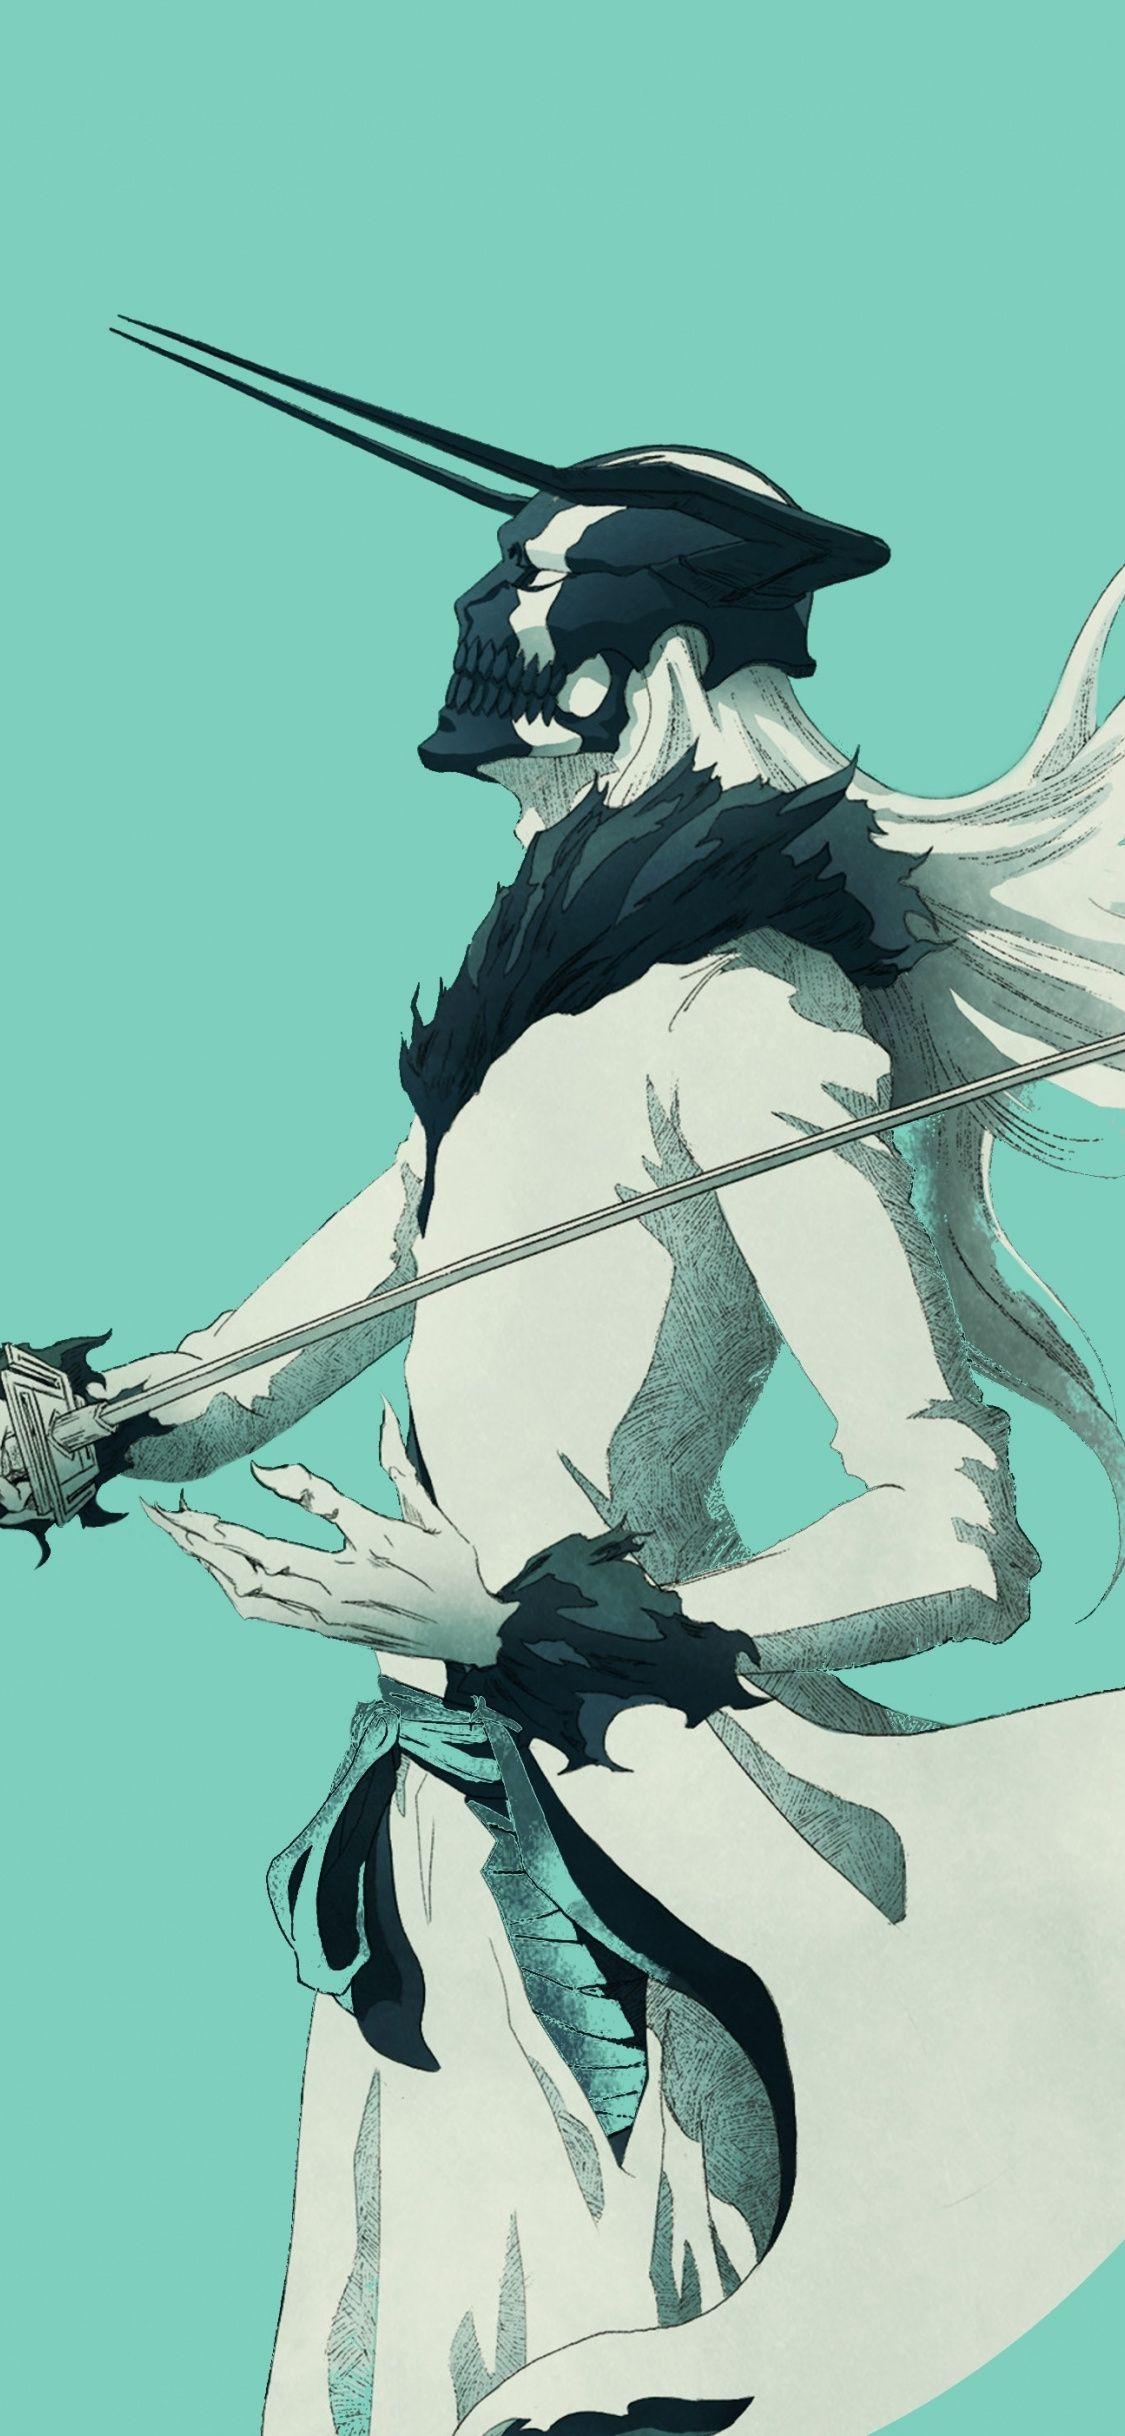 Anime, artwork, Ichigo Kurosaki, Bleach, 1125x2436